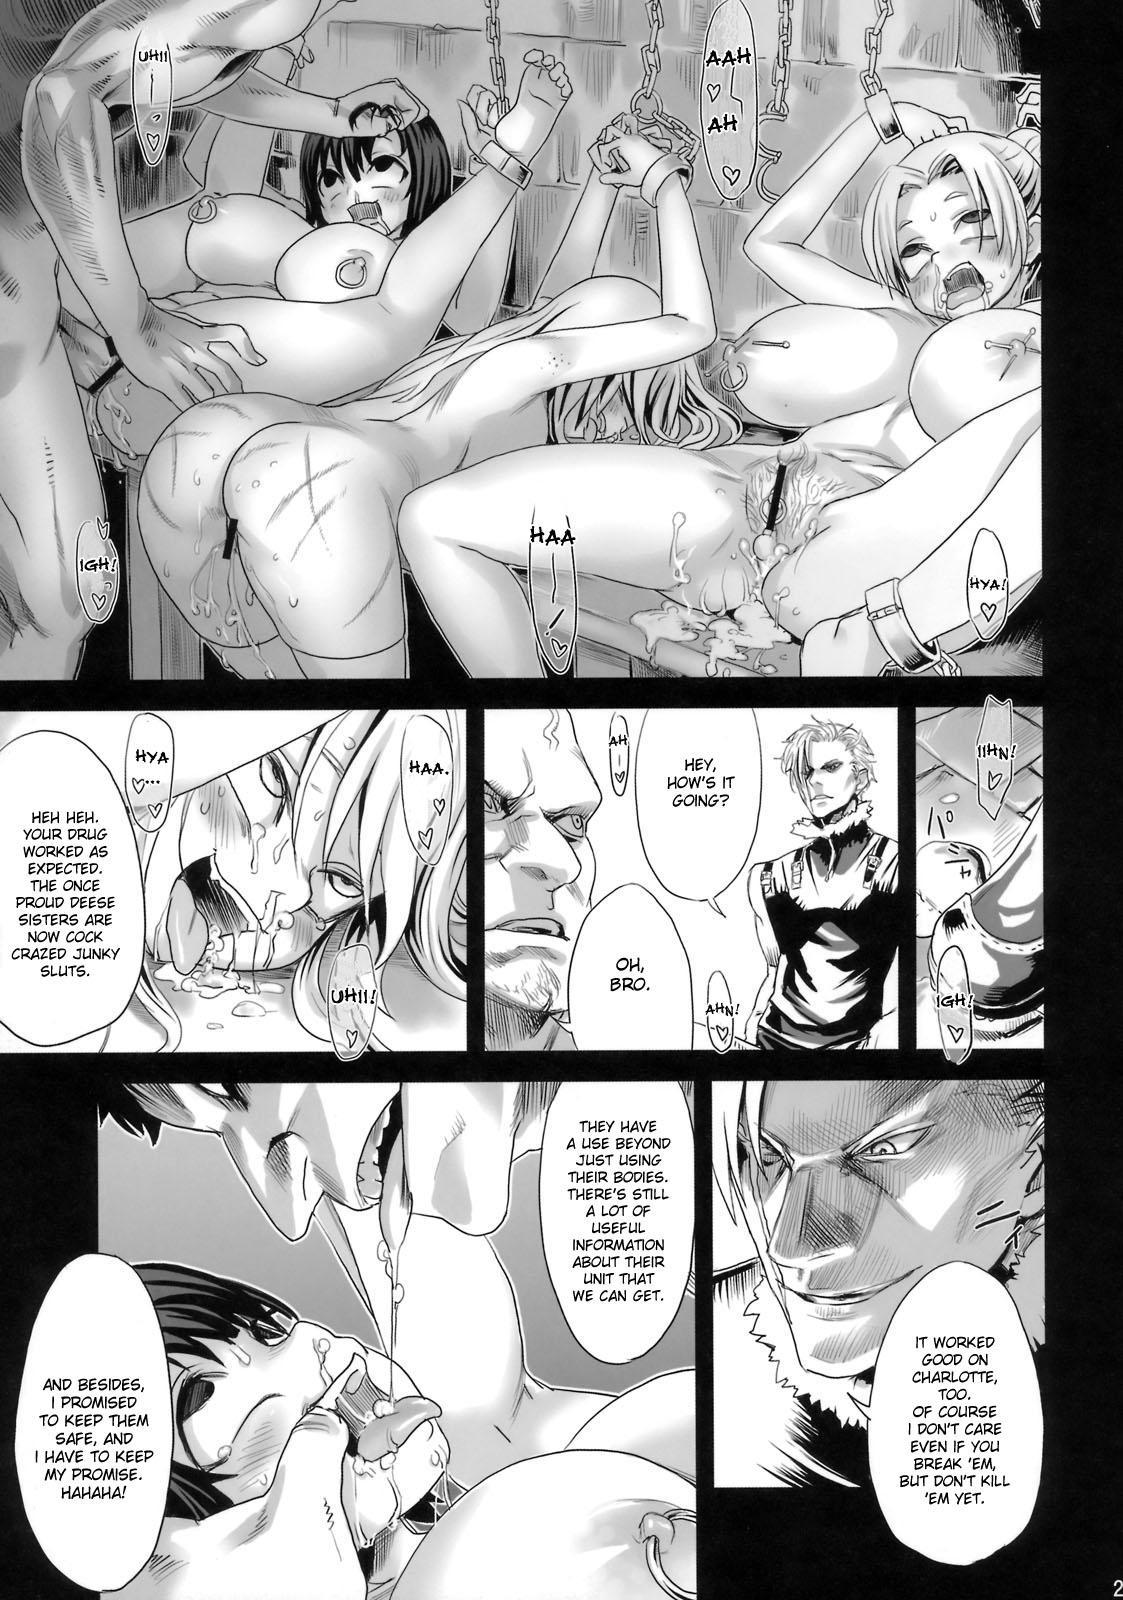 (C76) [Fatalpulse (Asanagi)] Victim Girls 7 - Jaku Niku Kyoushoku Dog-eat-Bitch (Fantasy Earth Zero) [English] [desudesu] 21